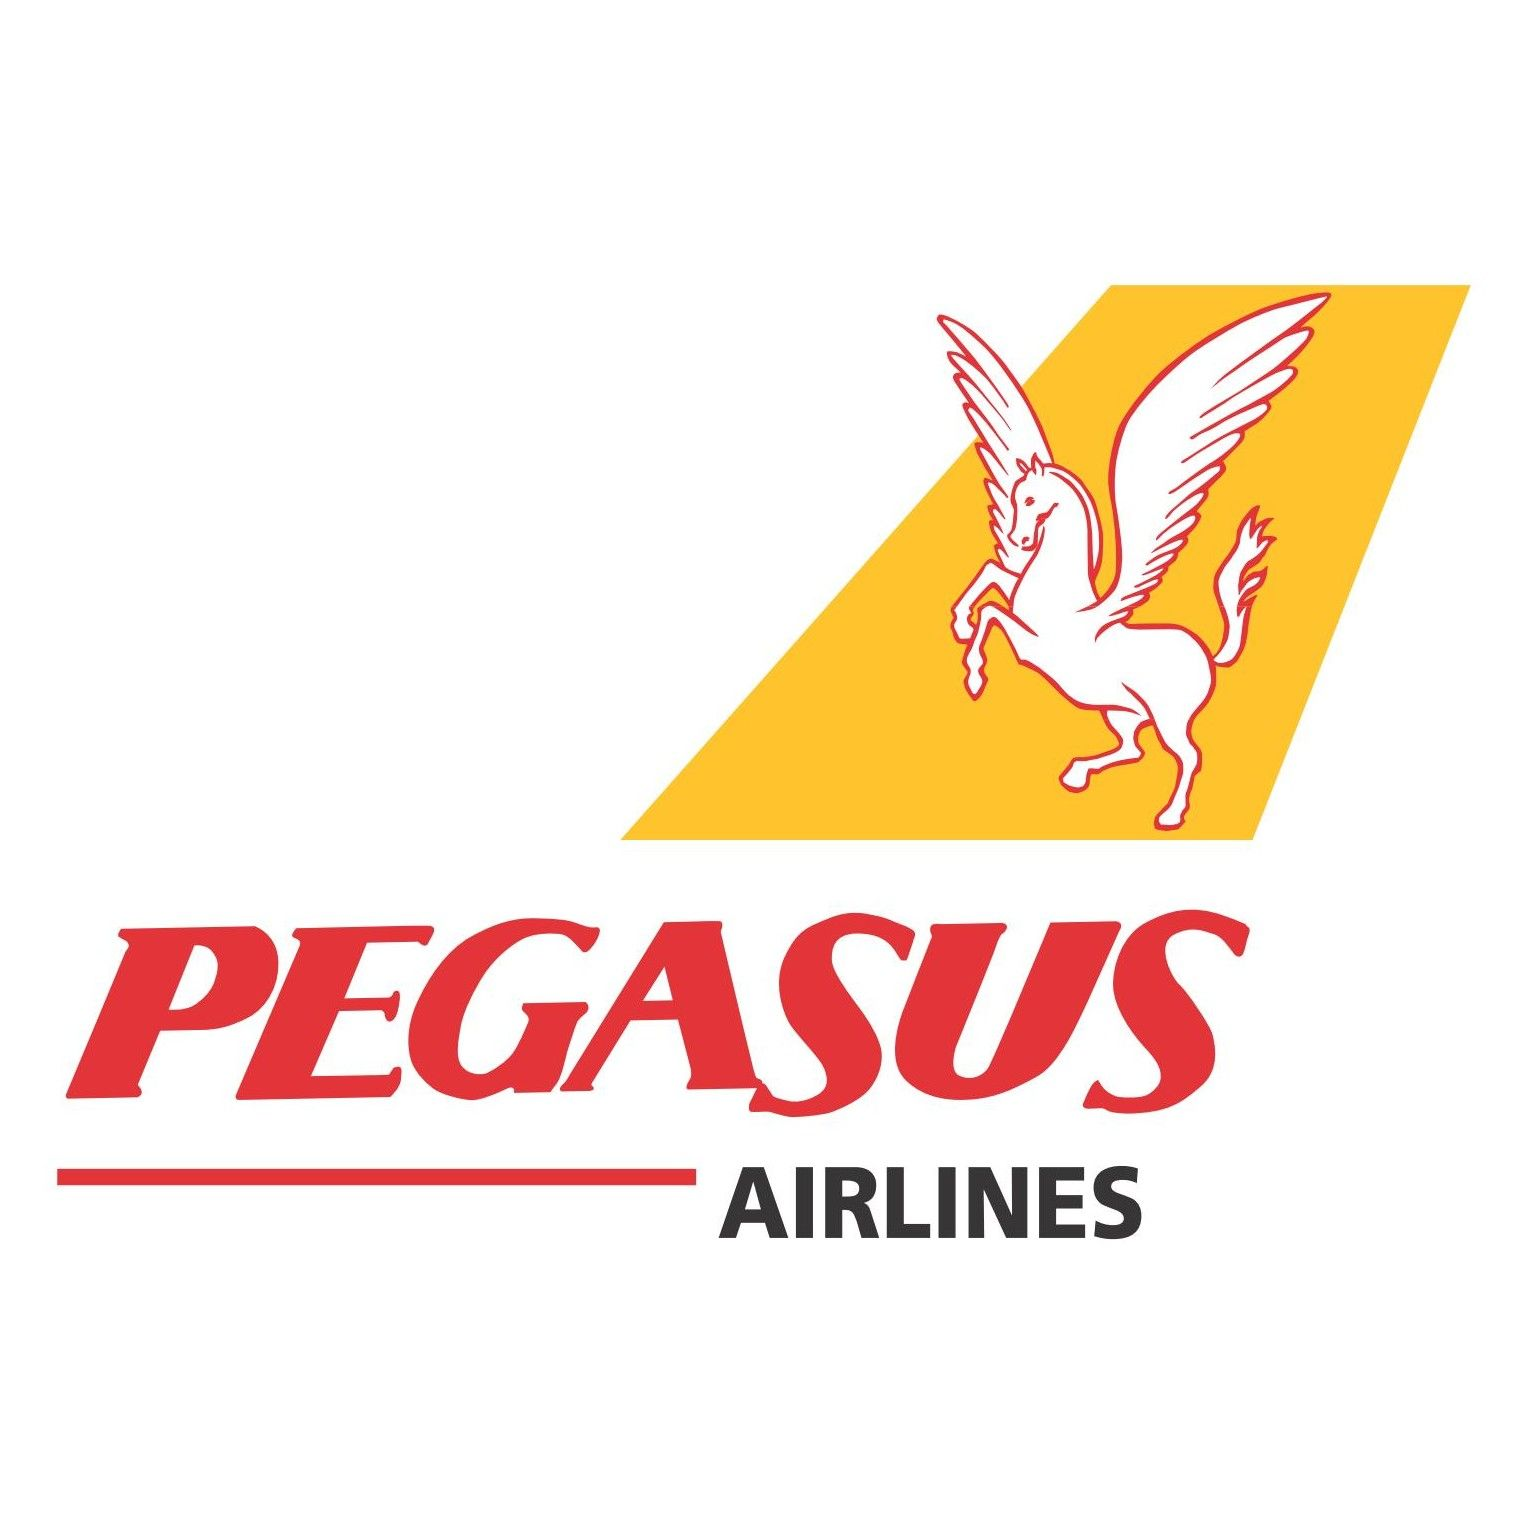 Pegasus Airlines Logo Tattoos Pinterest Pegasus Airlines And Logos